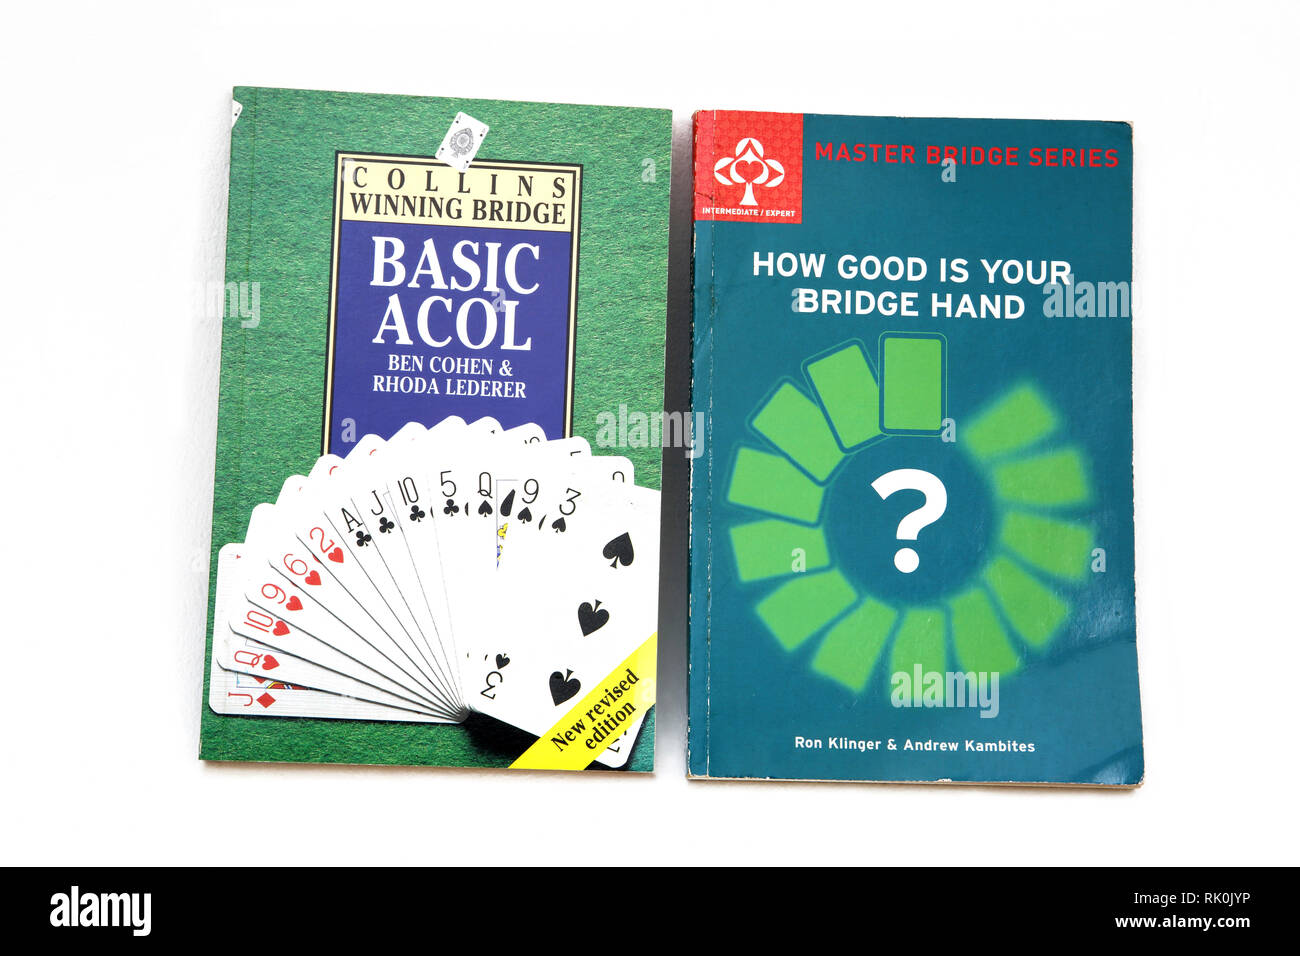 Books on Bridge - Collins Winning Bridge Basic Acol and How Good Is your Bridge Hand - Stock Image